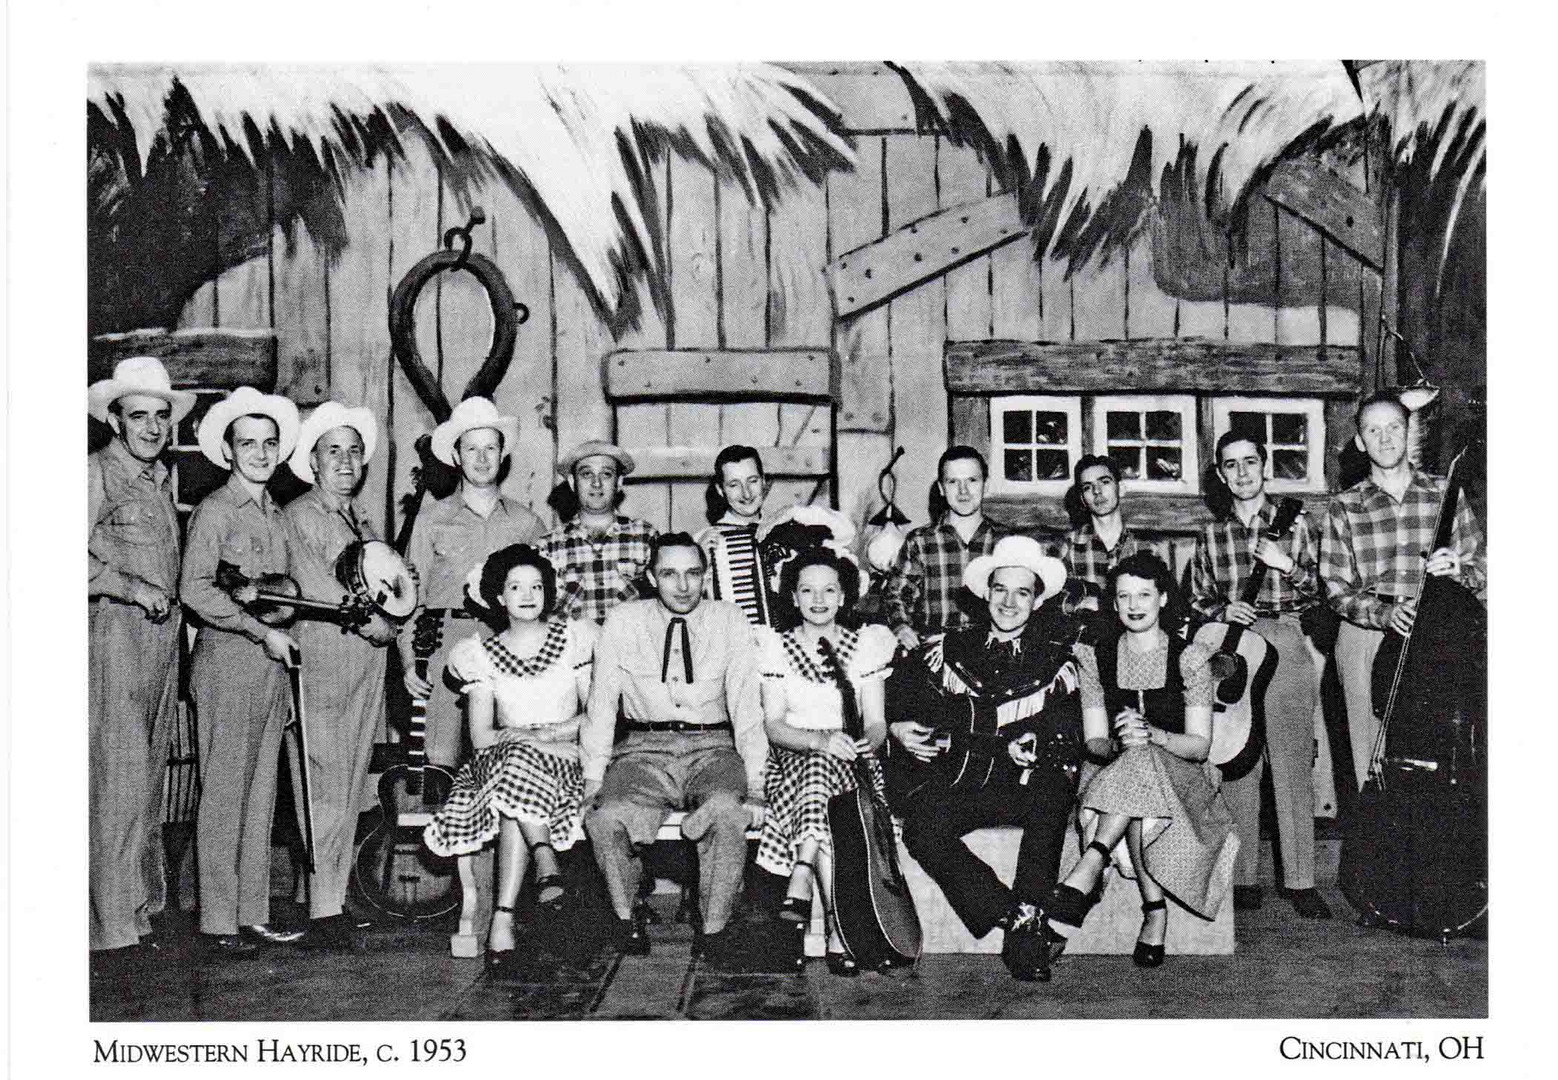 Midwestern Hayride Cast on a Postcard.